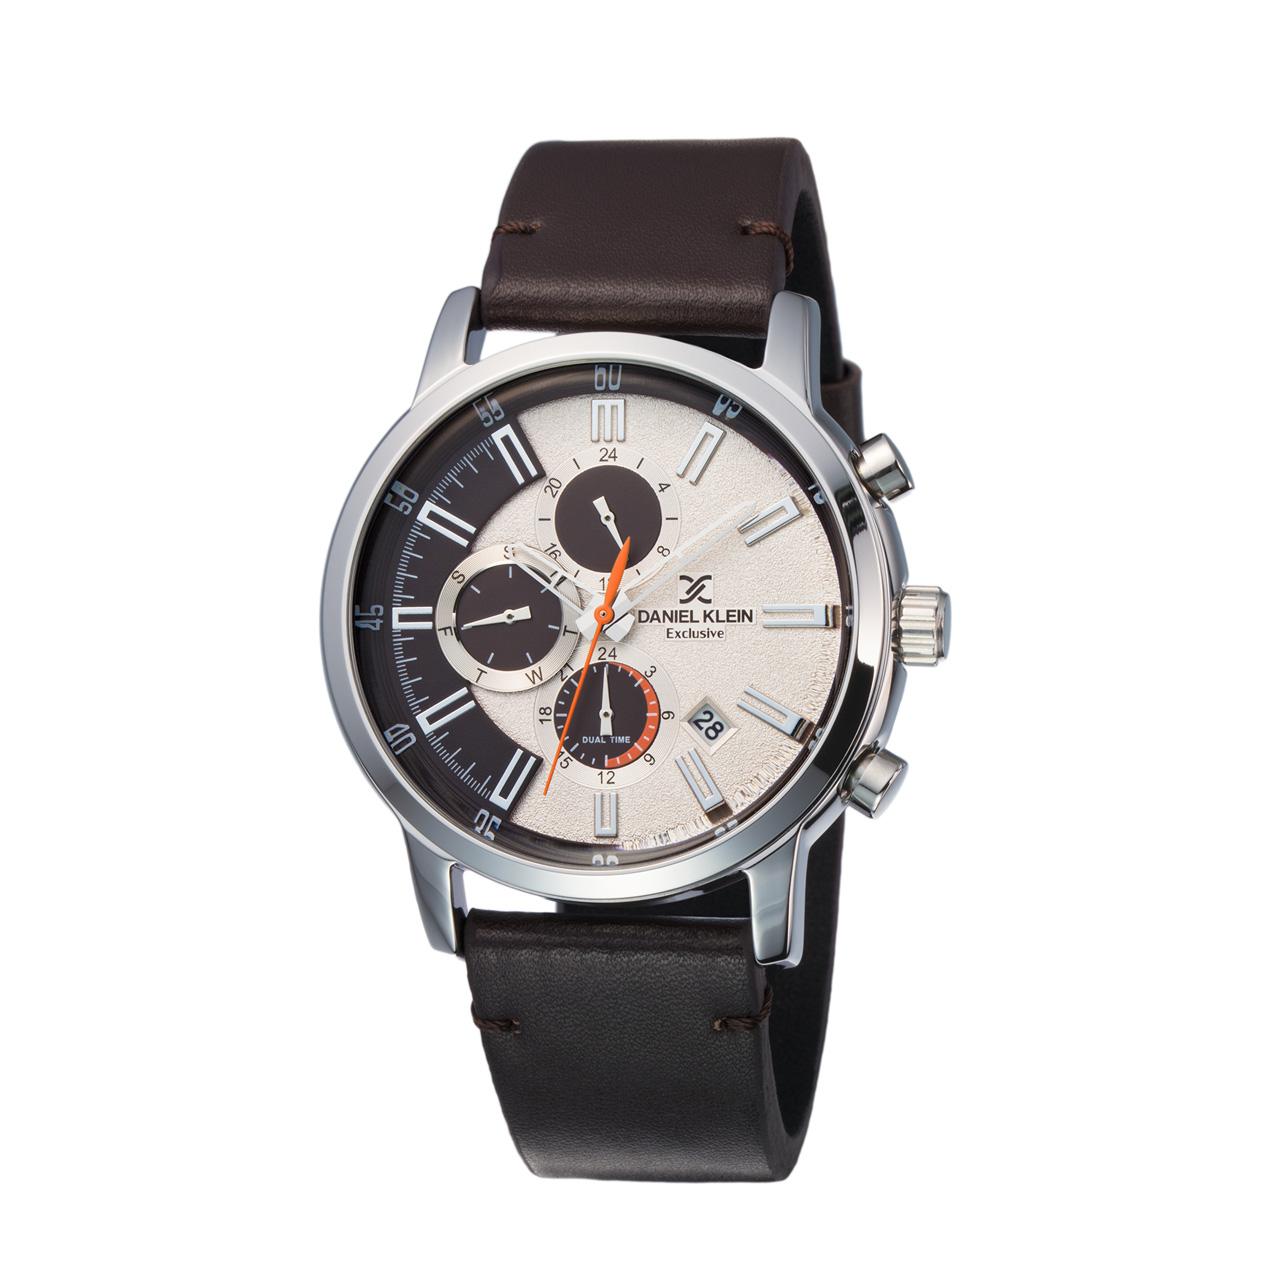 Ceas pentru barbati, Daniel Klein Exclusive, DK11843-4